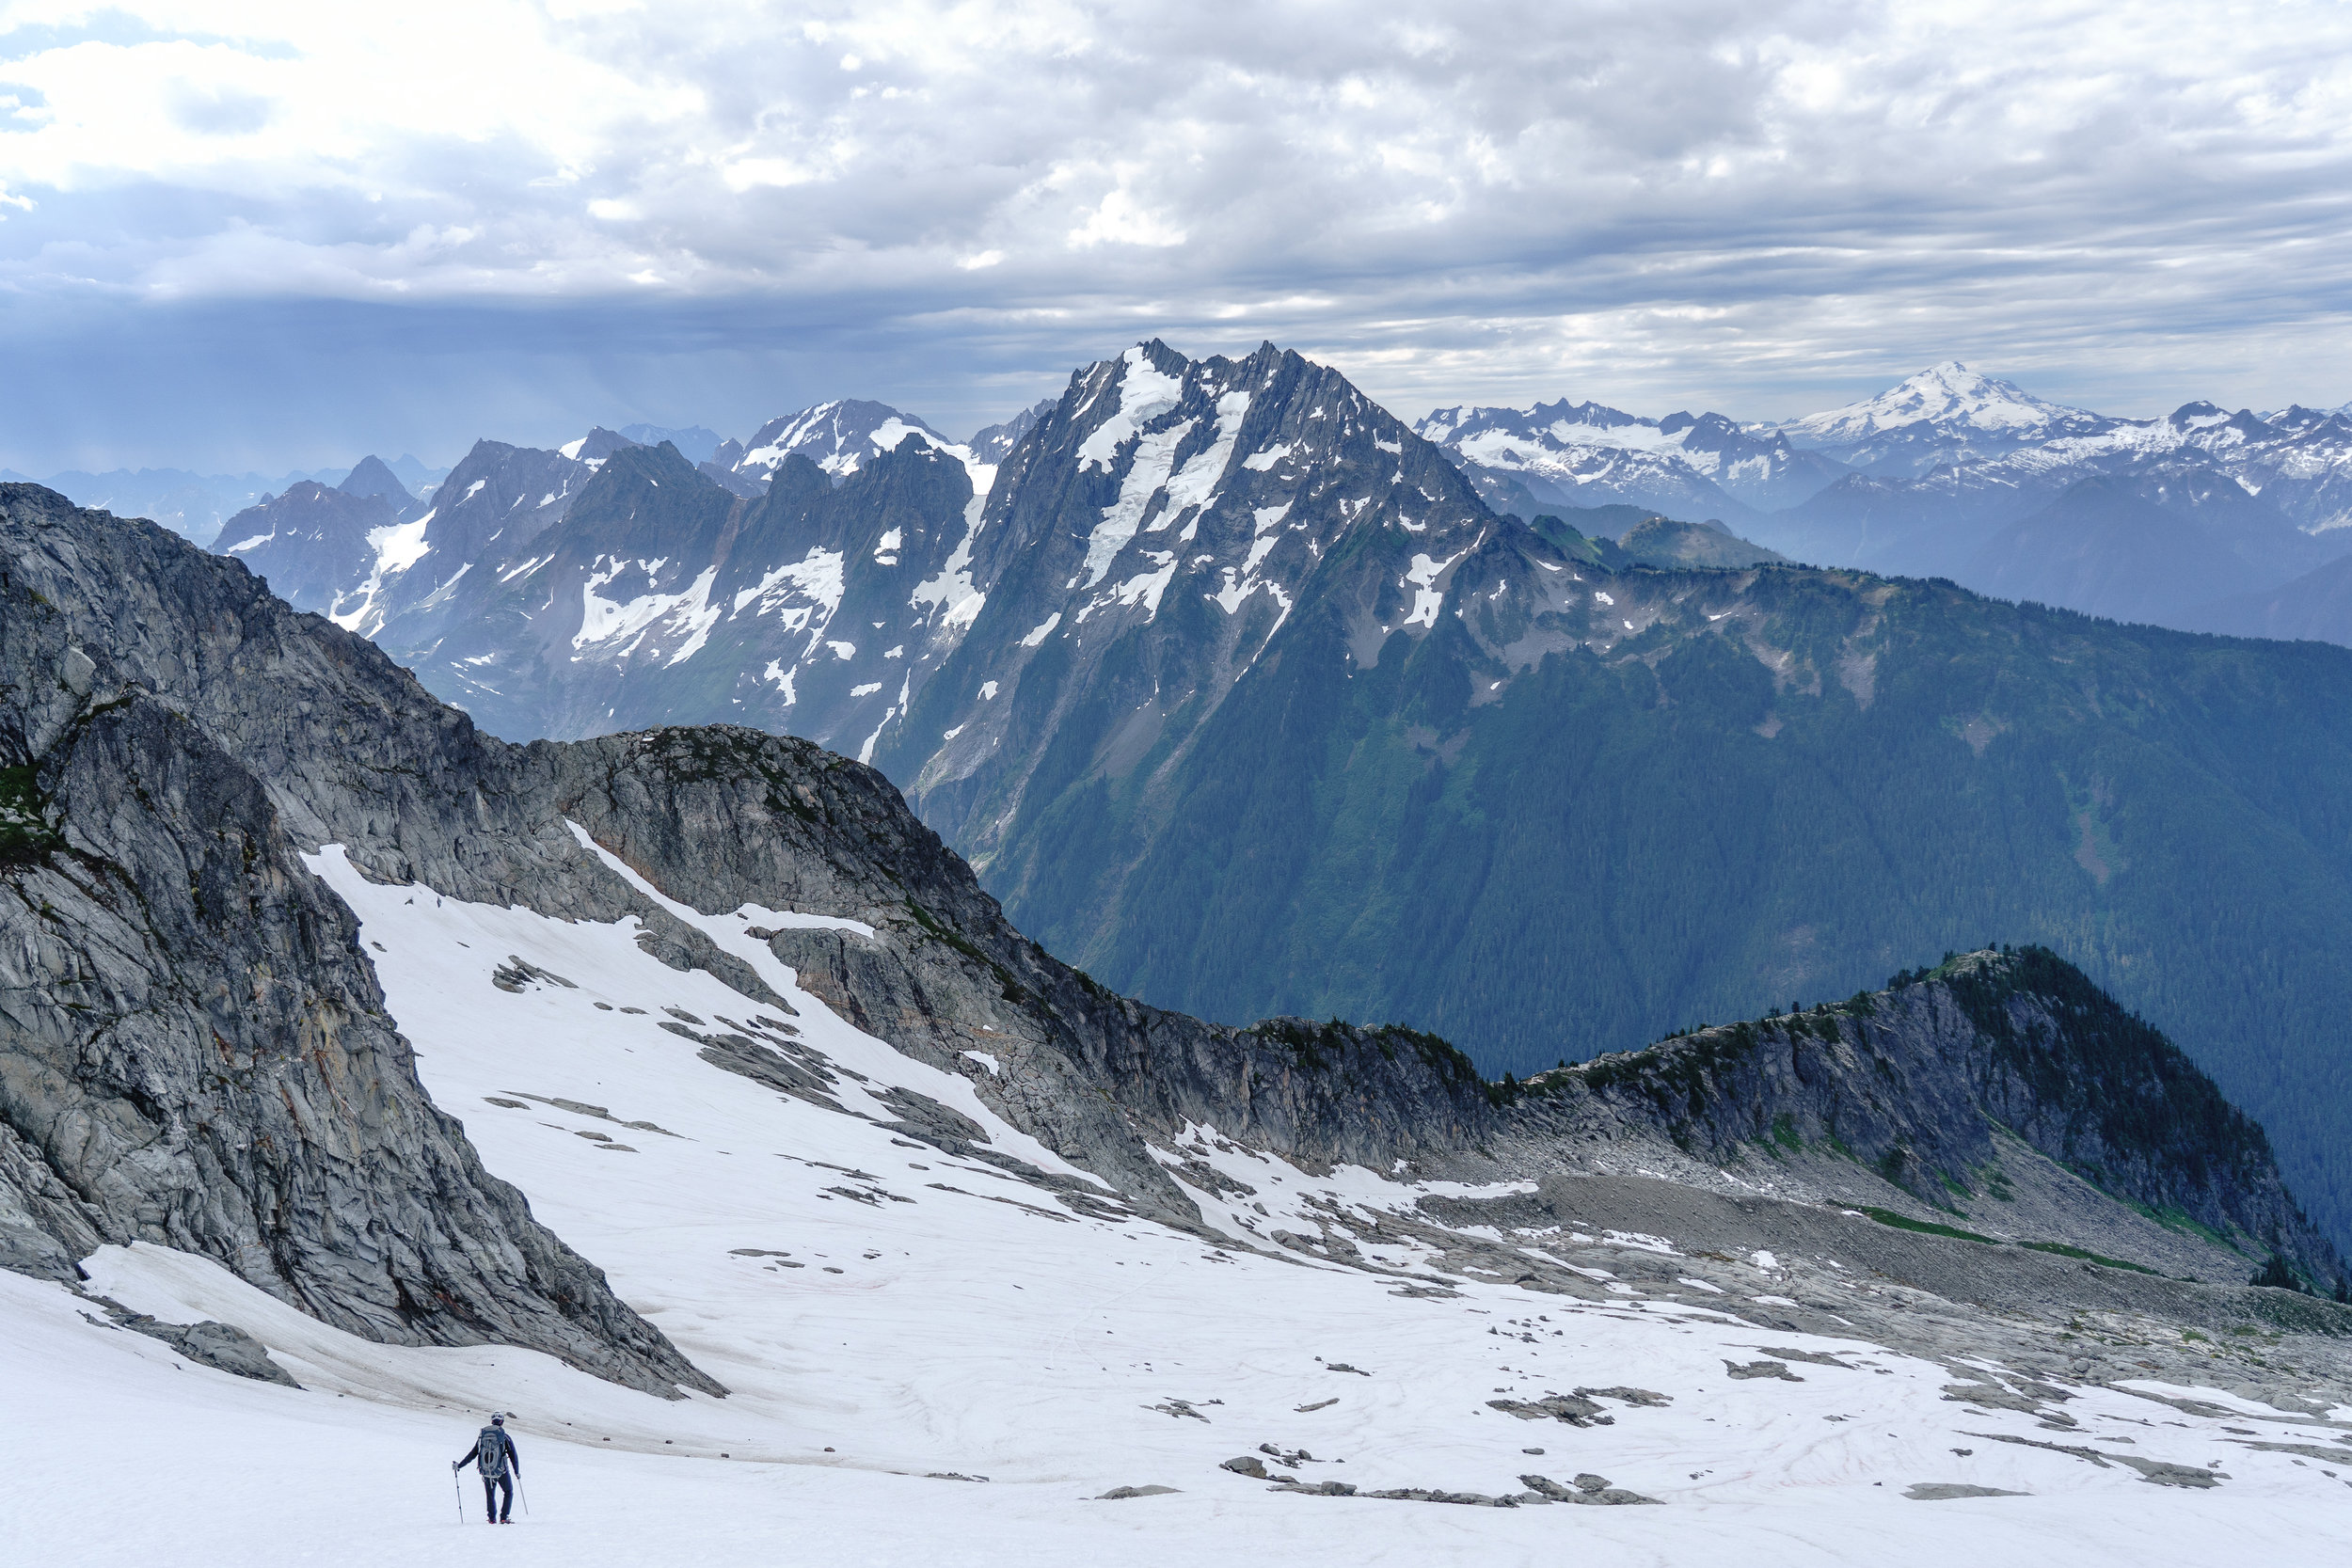 Hiking down. Glacier Peak far in the distance.